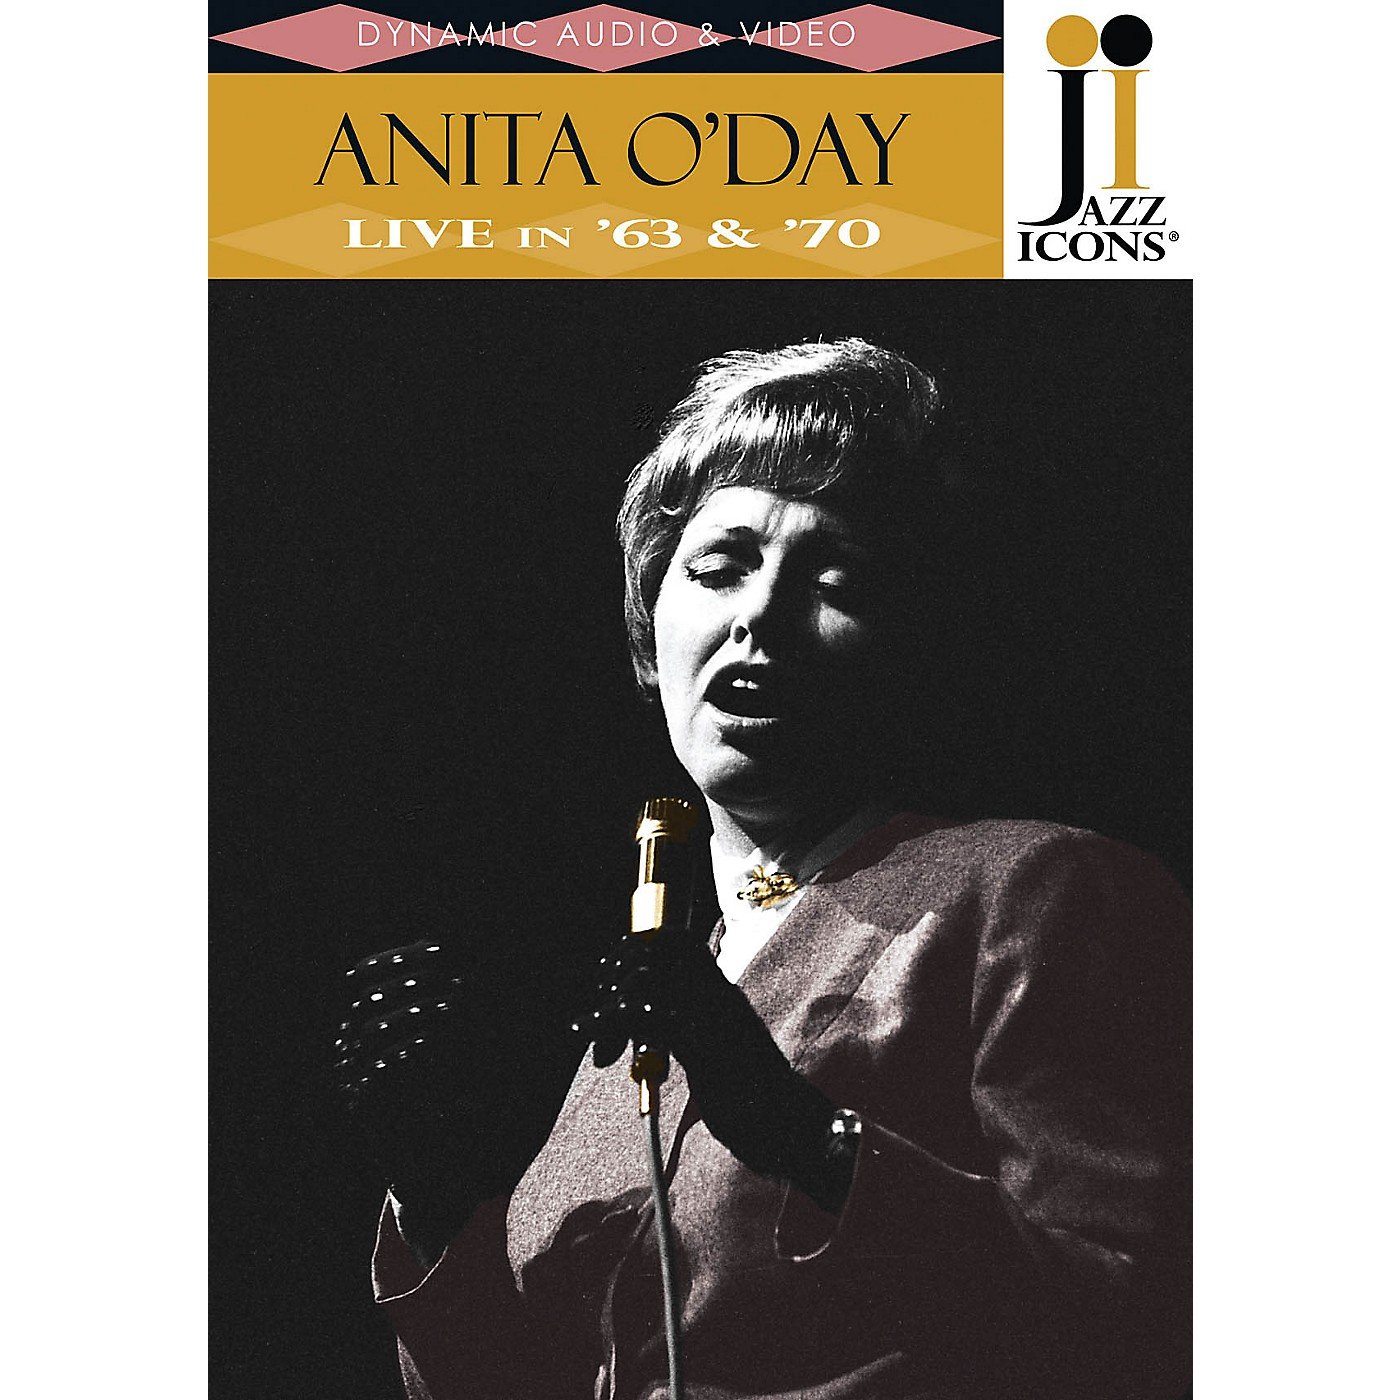 Jazz Icons Anita O'Day - Live in '63 & '70 (Jazz Icons DVD) DVD Series DVD Performed by Anita O'Day thumbnail